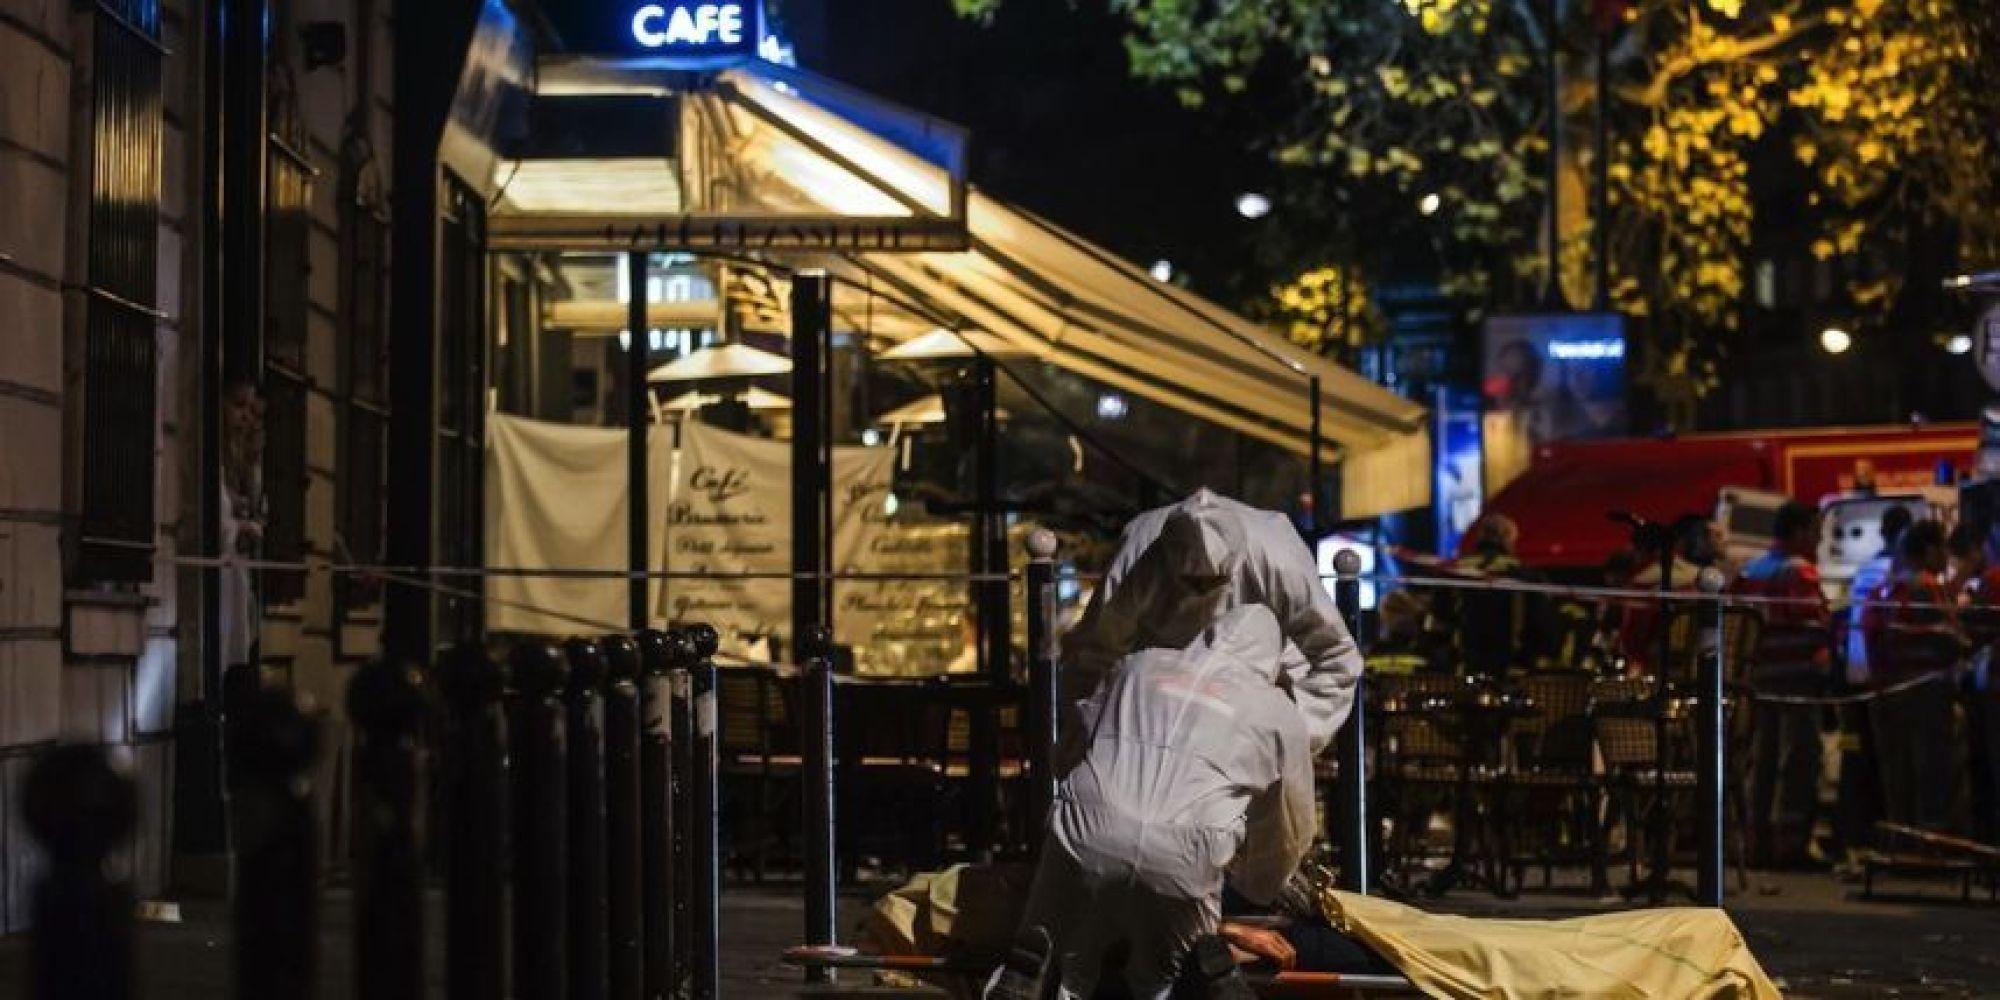 Attentat Facebook: Violence Aveugle Des Attentats De Paris: La Faute